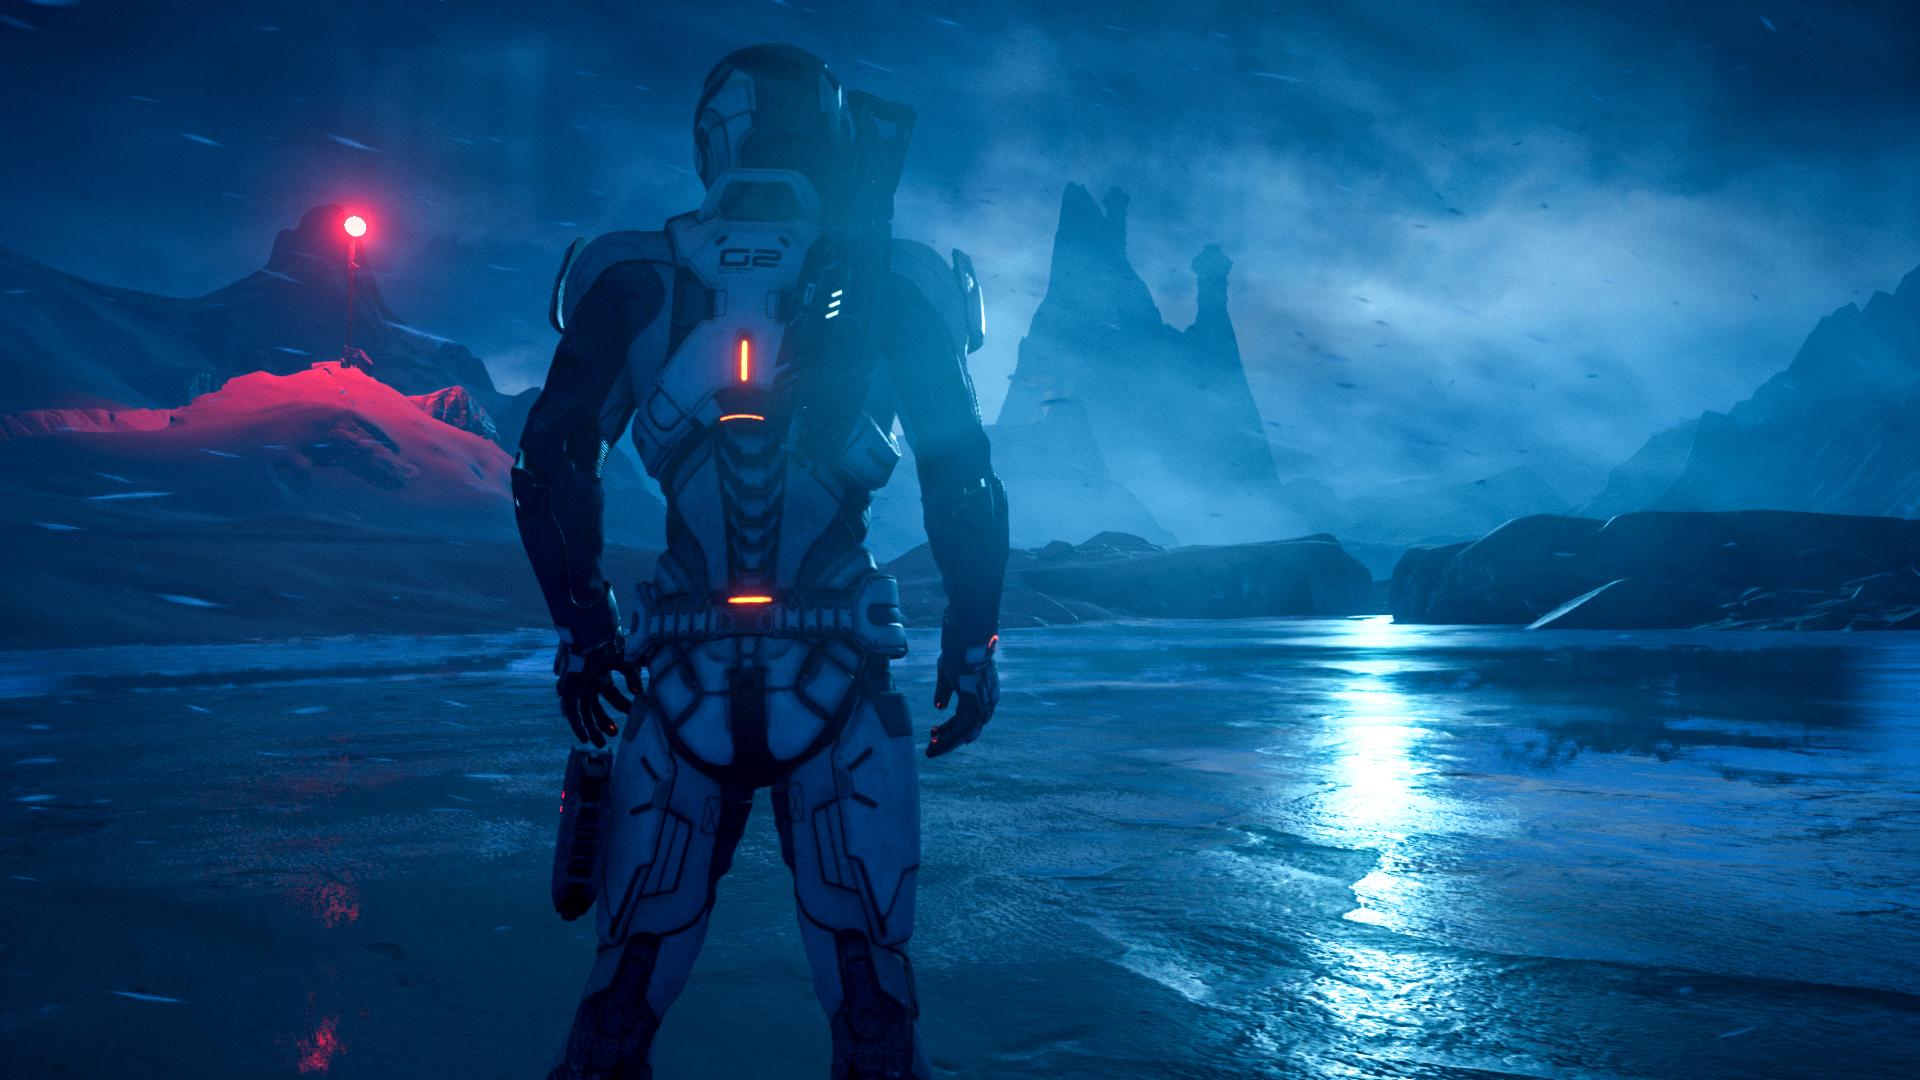 Michael Gamble revelará nuevos detalles de Mass Effect Andromeda en pocas horas